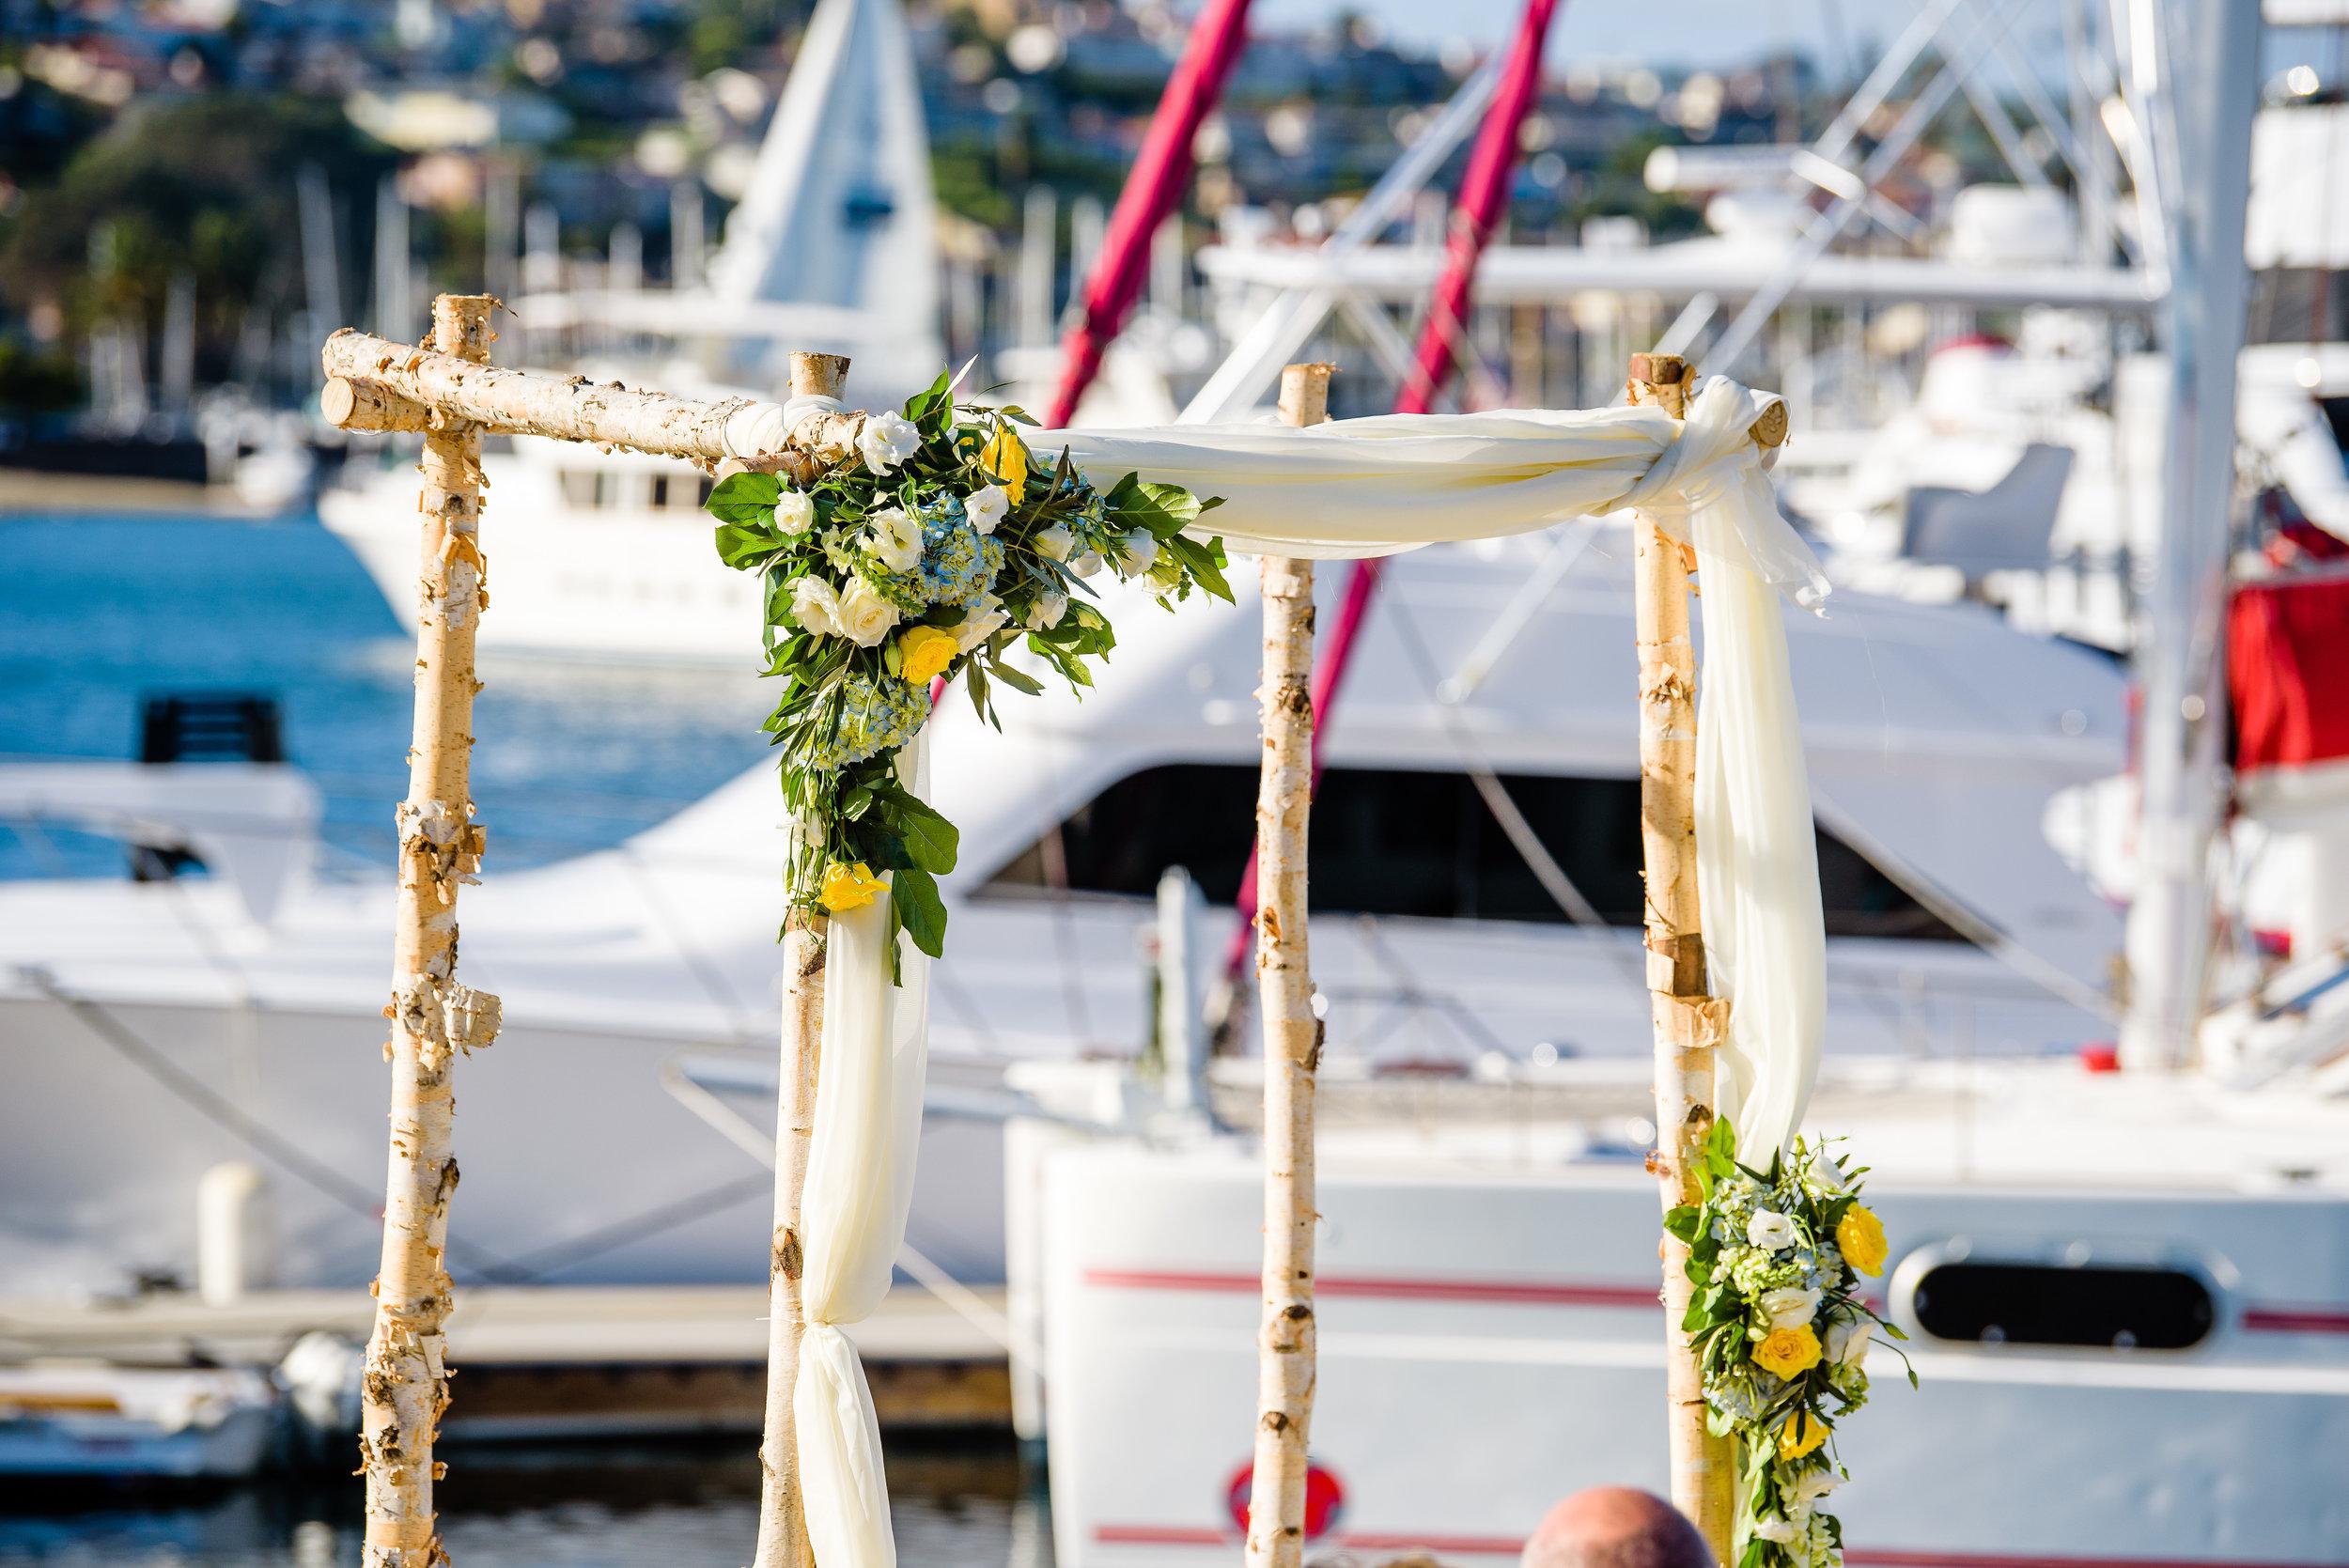 9.22.17+-+Avery+and+Cory+Wedding+-+Kona+Kai+-+Paul+Douda+Photography+-+392.jpg